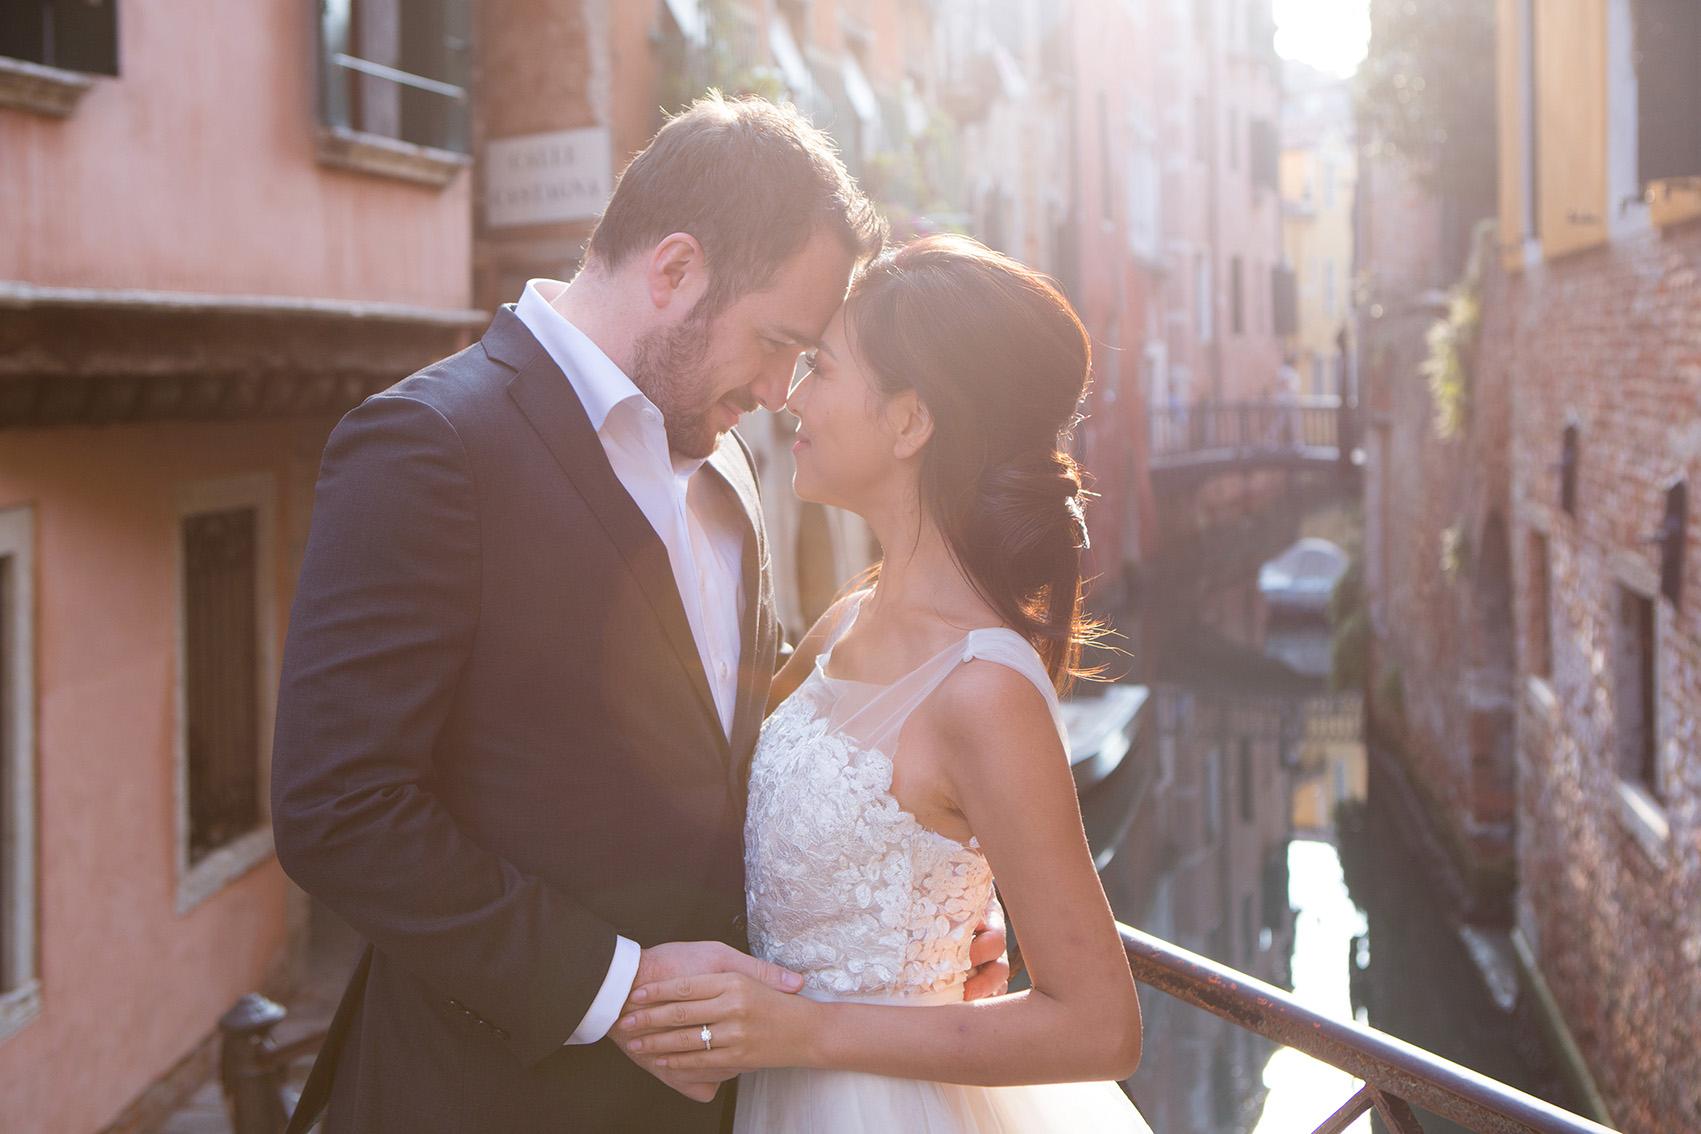 Honeymoon Photography in Venice